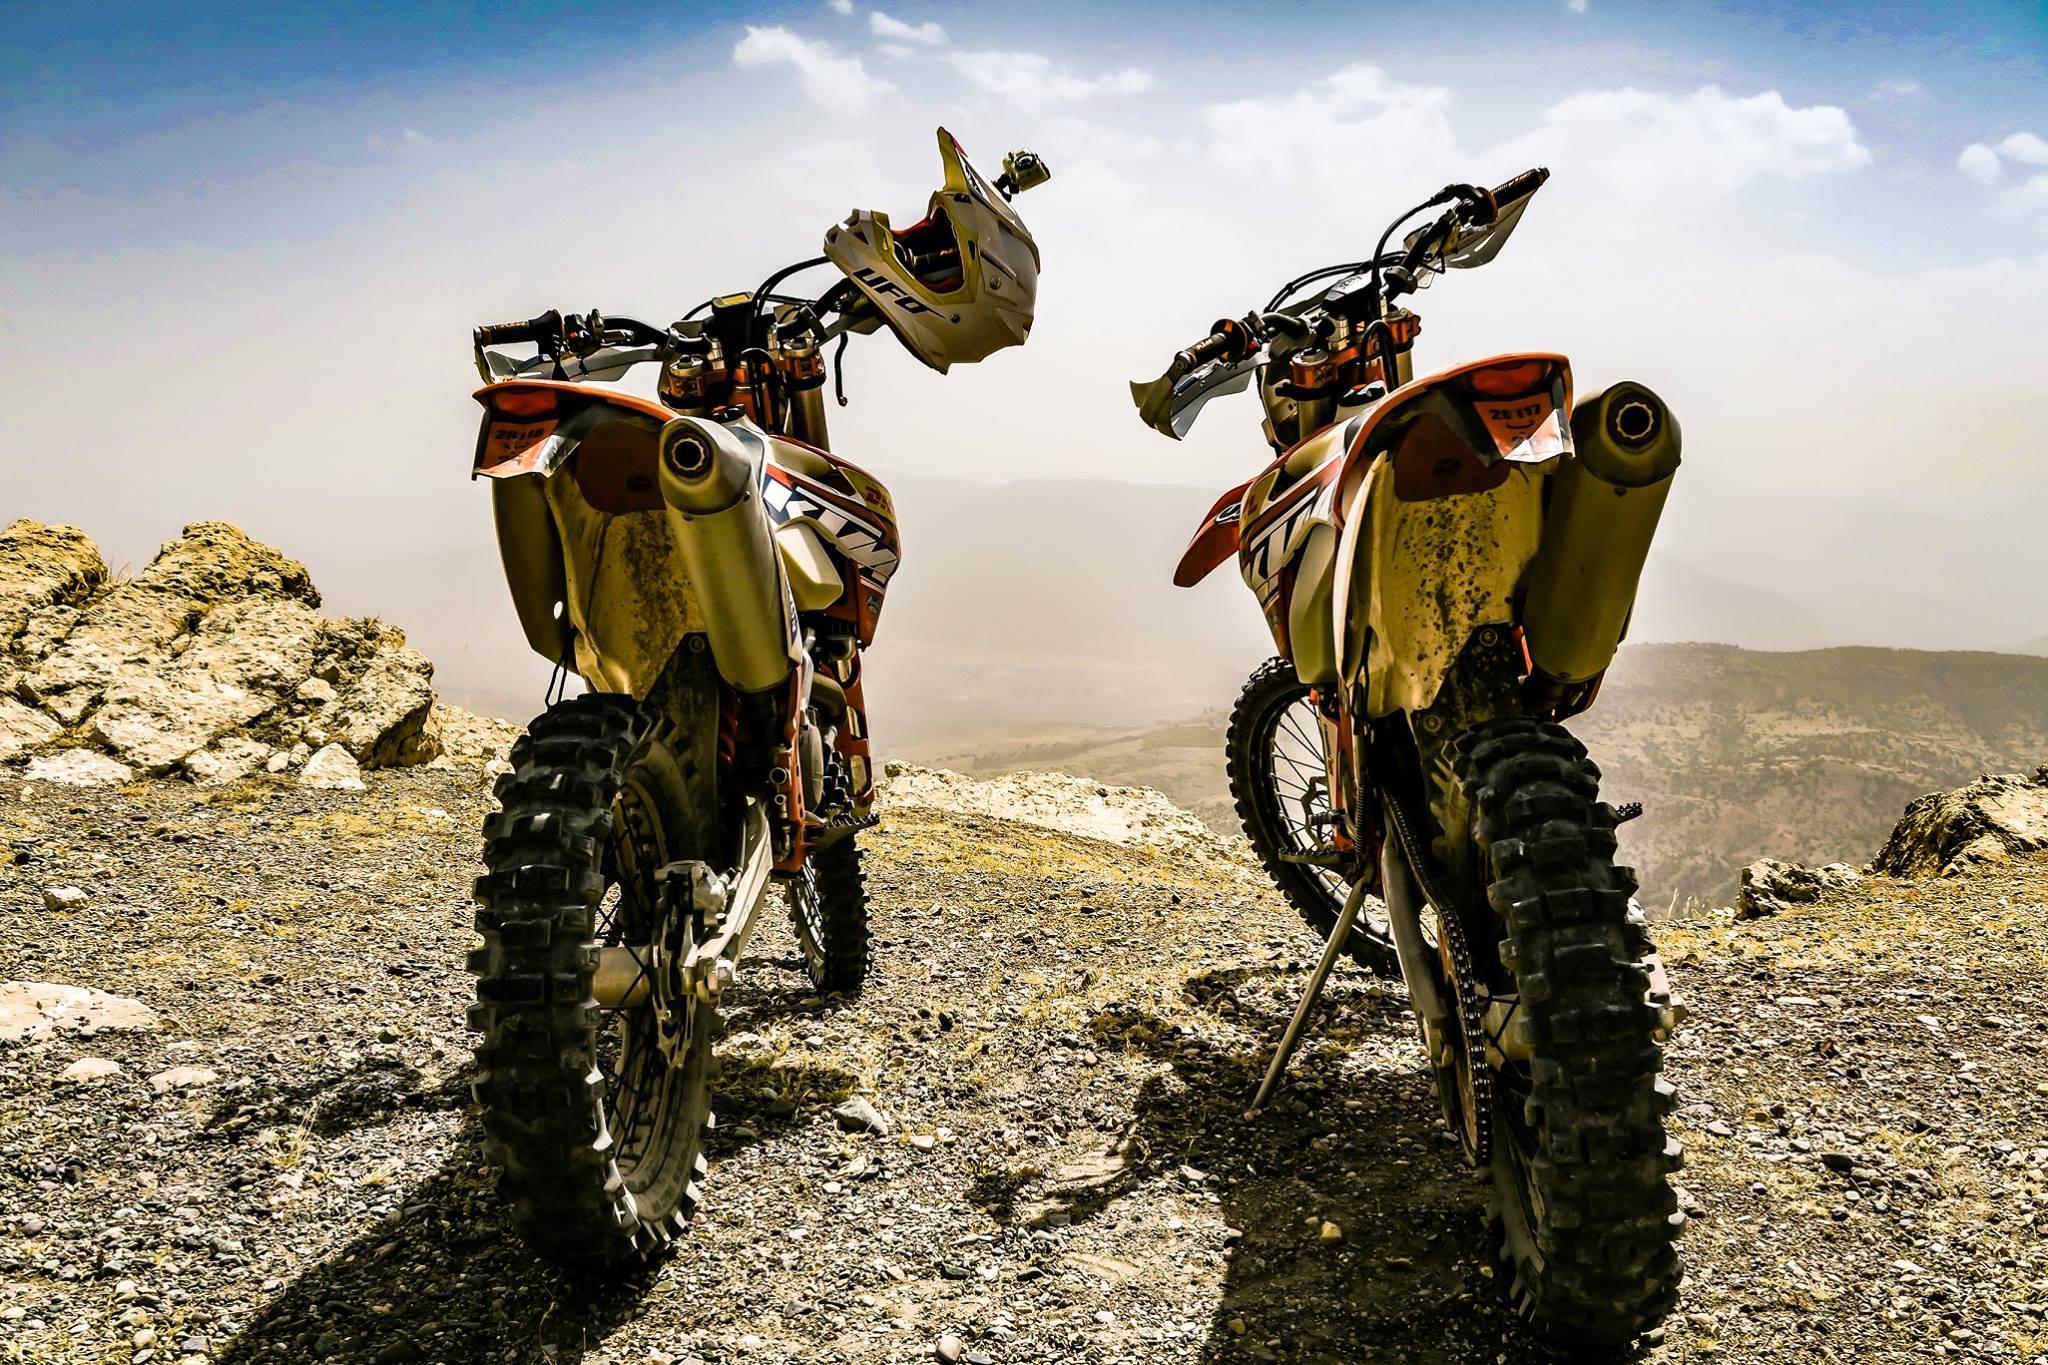 off road motorcycling day trip morocco raid moto maroc. Black Bedroom Furniture Sets. Home Design Ideas